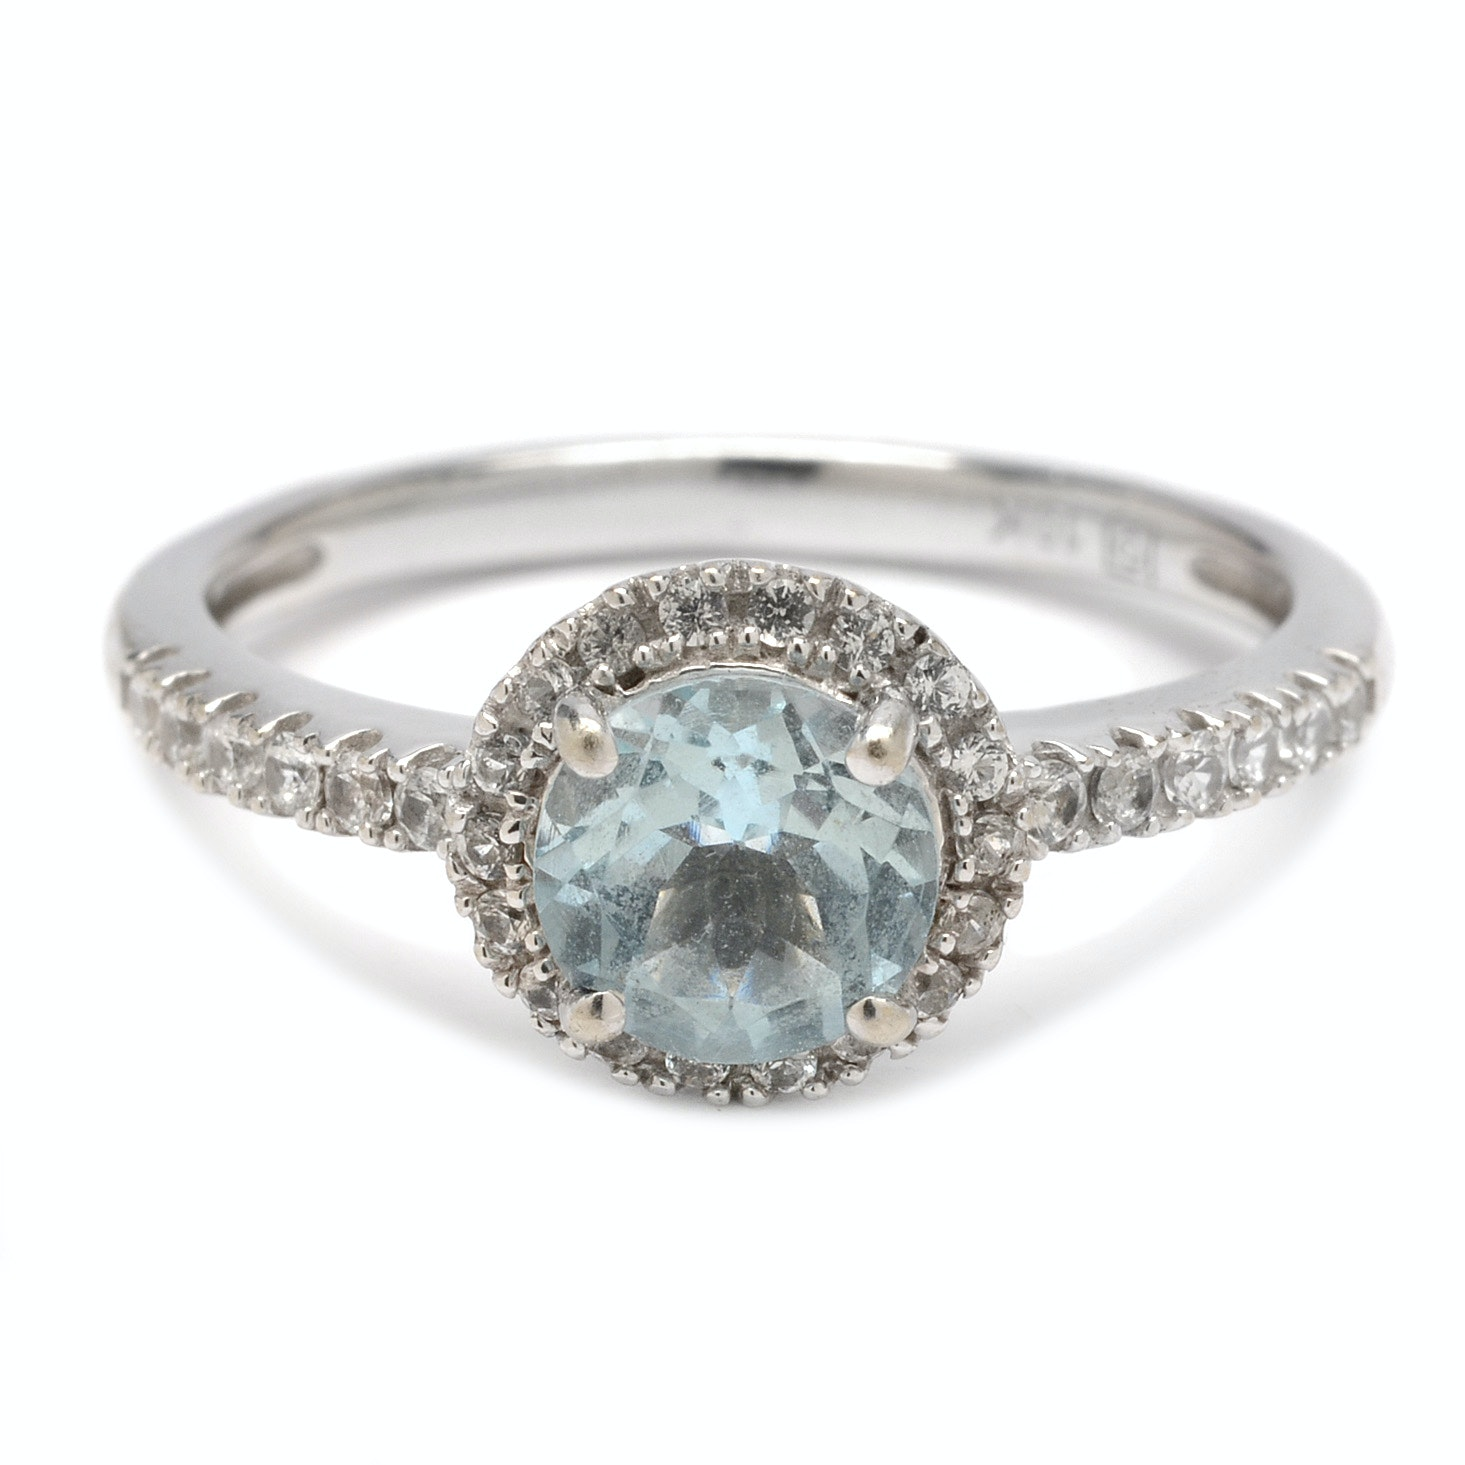 10K White Gold Aquamarine and White Sapphire Ring